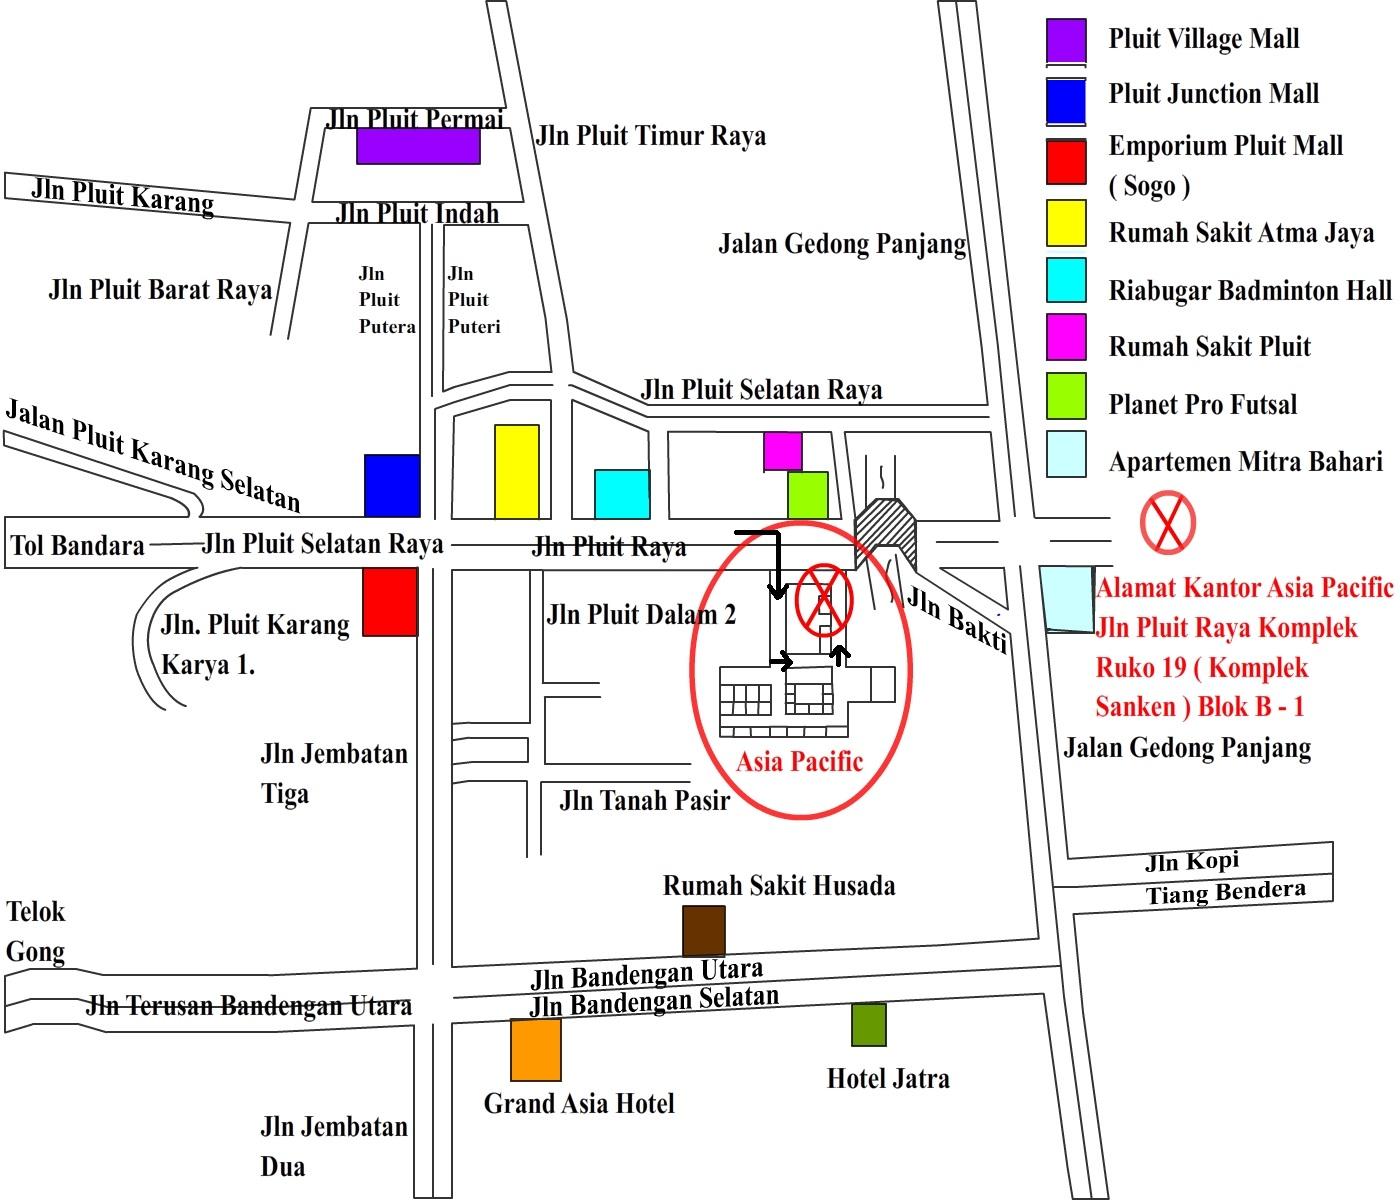 Gambar Peta Alamat Kantor Obat Fengshibao Asia Pacific